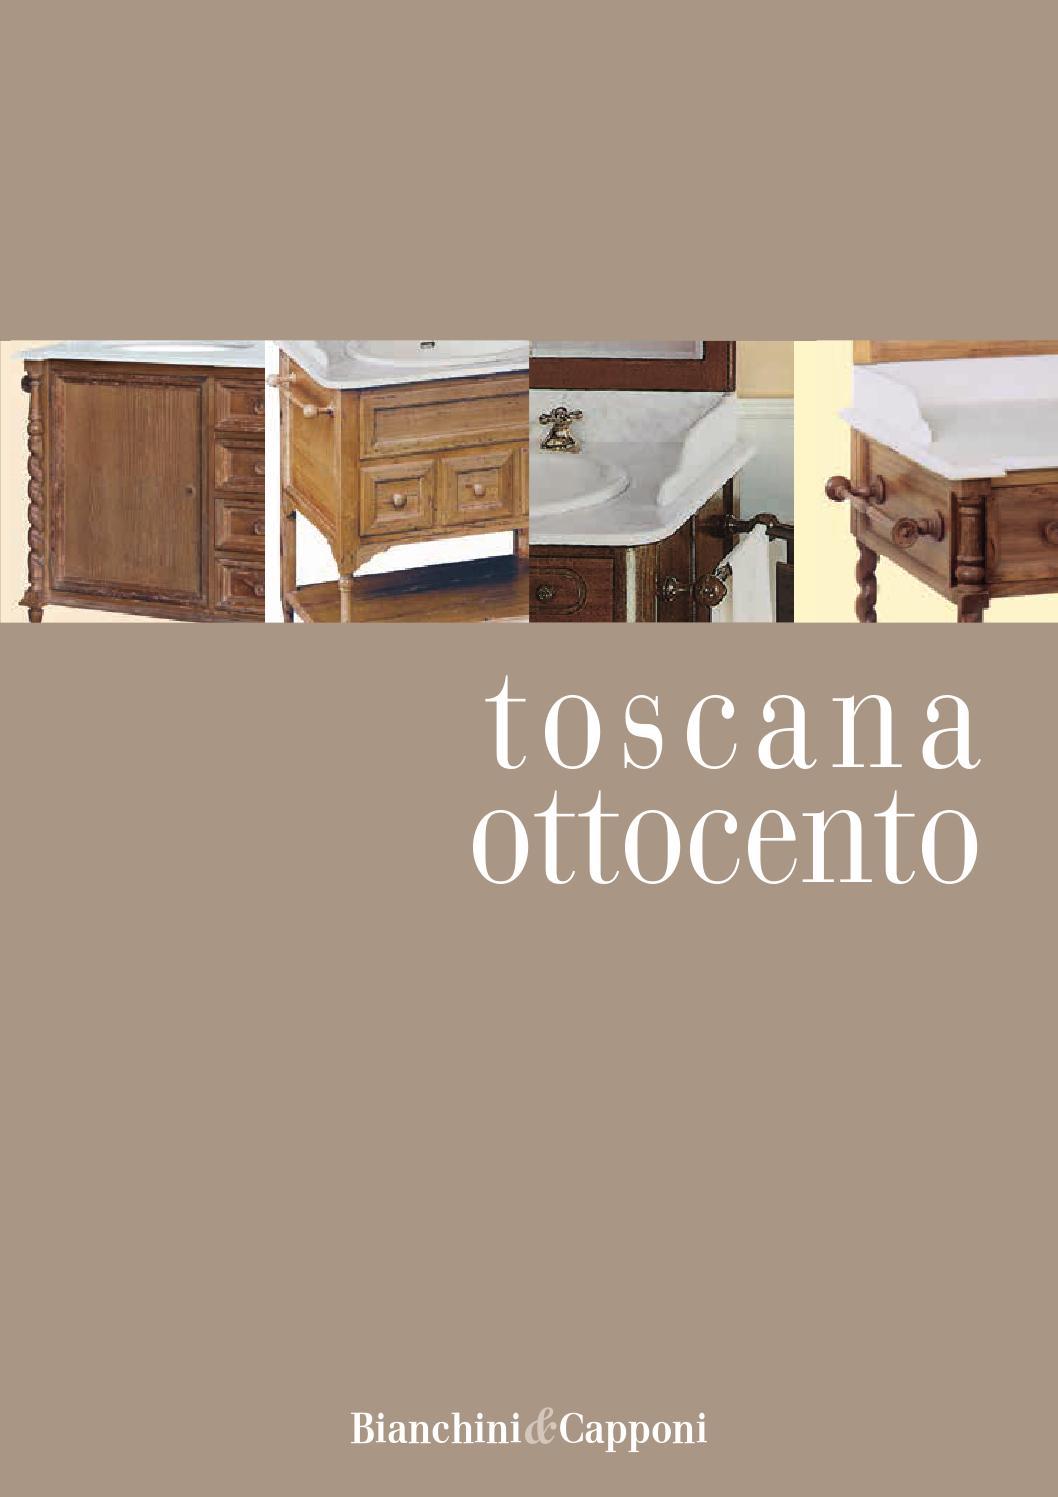 Bianchini capponi catalogo toscana 800 2014 by 100interior - issuu